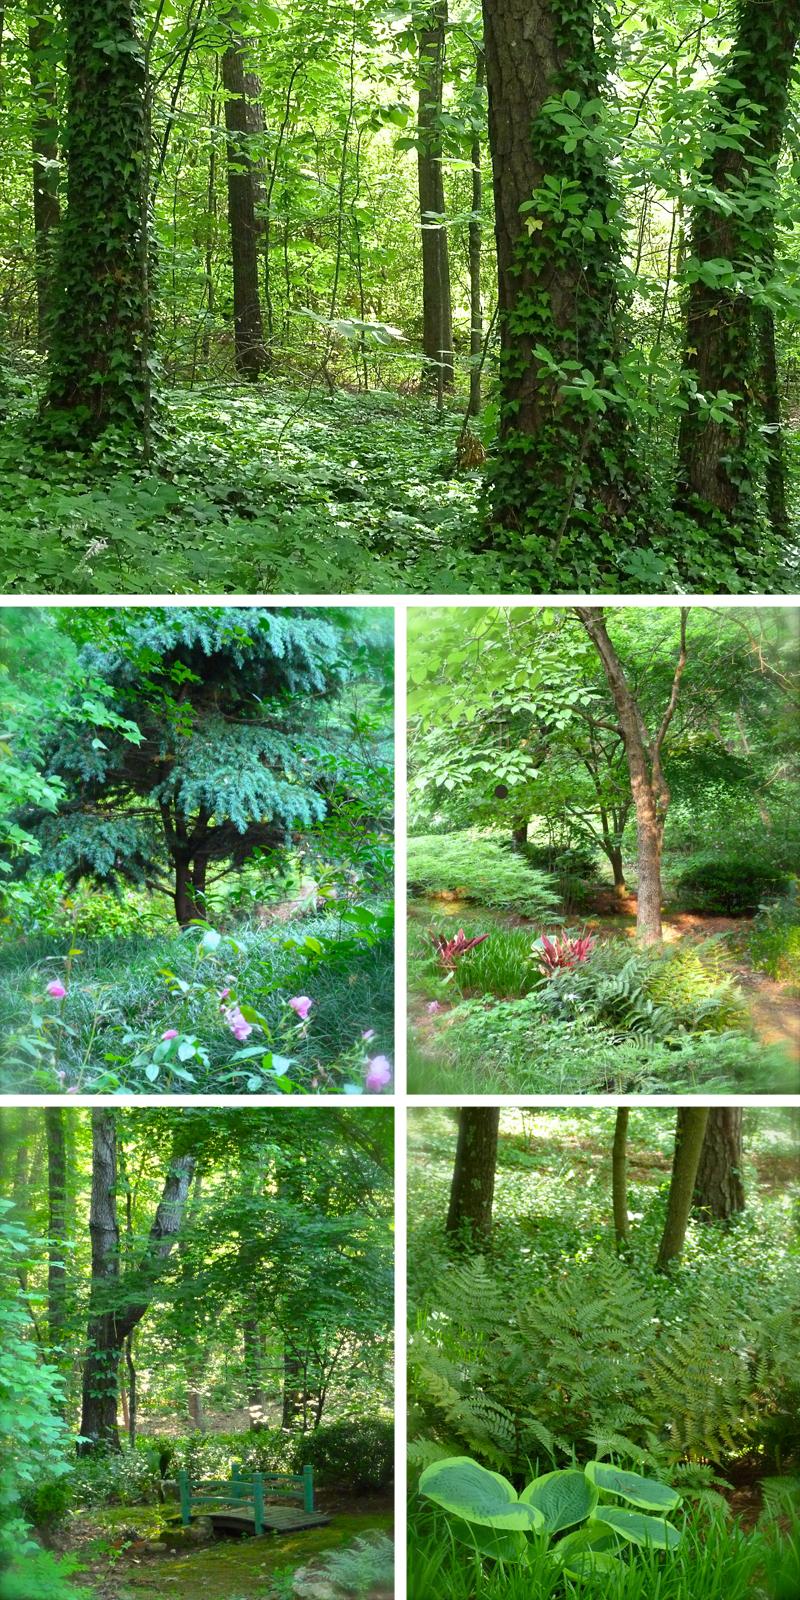 A Little Bit Of Jungle Deb 39 S Garden Deb 39 S Garden Blog